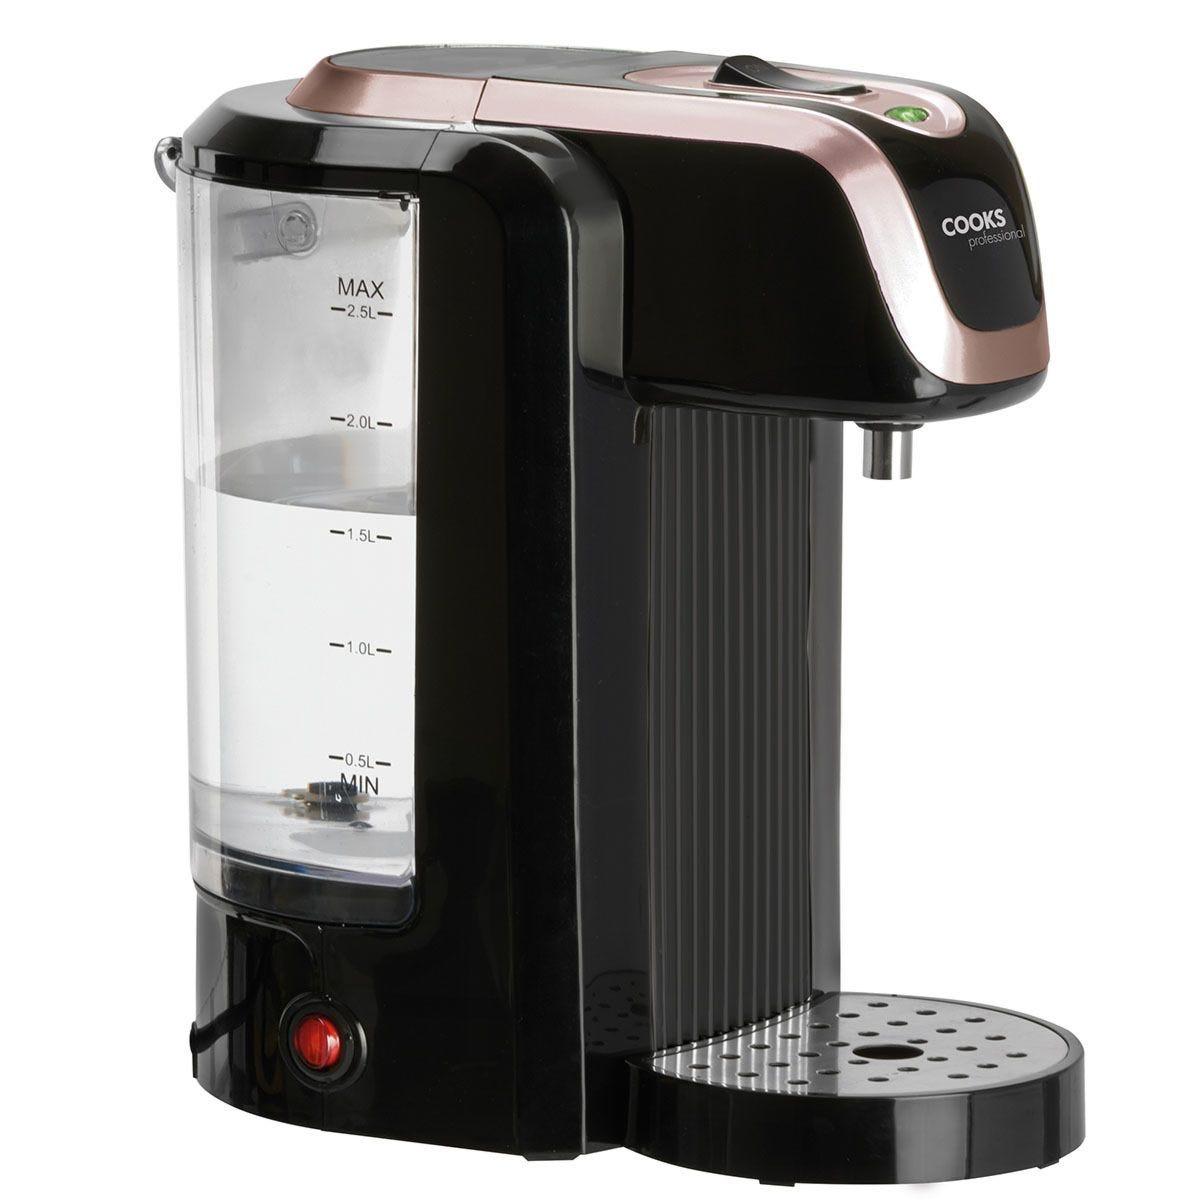 Cooks Professional G4239 2.5L Hot Water Dispenser – Black & Rose Gold